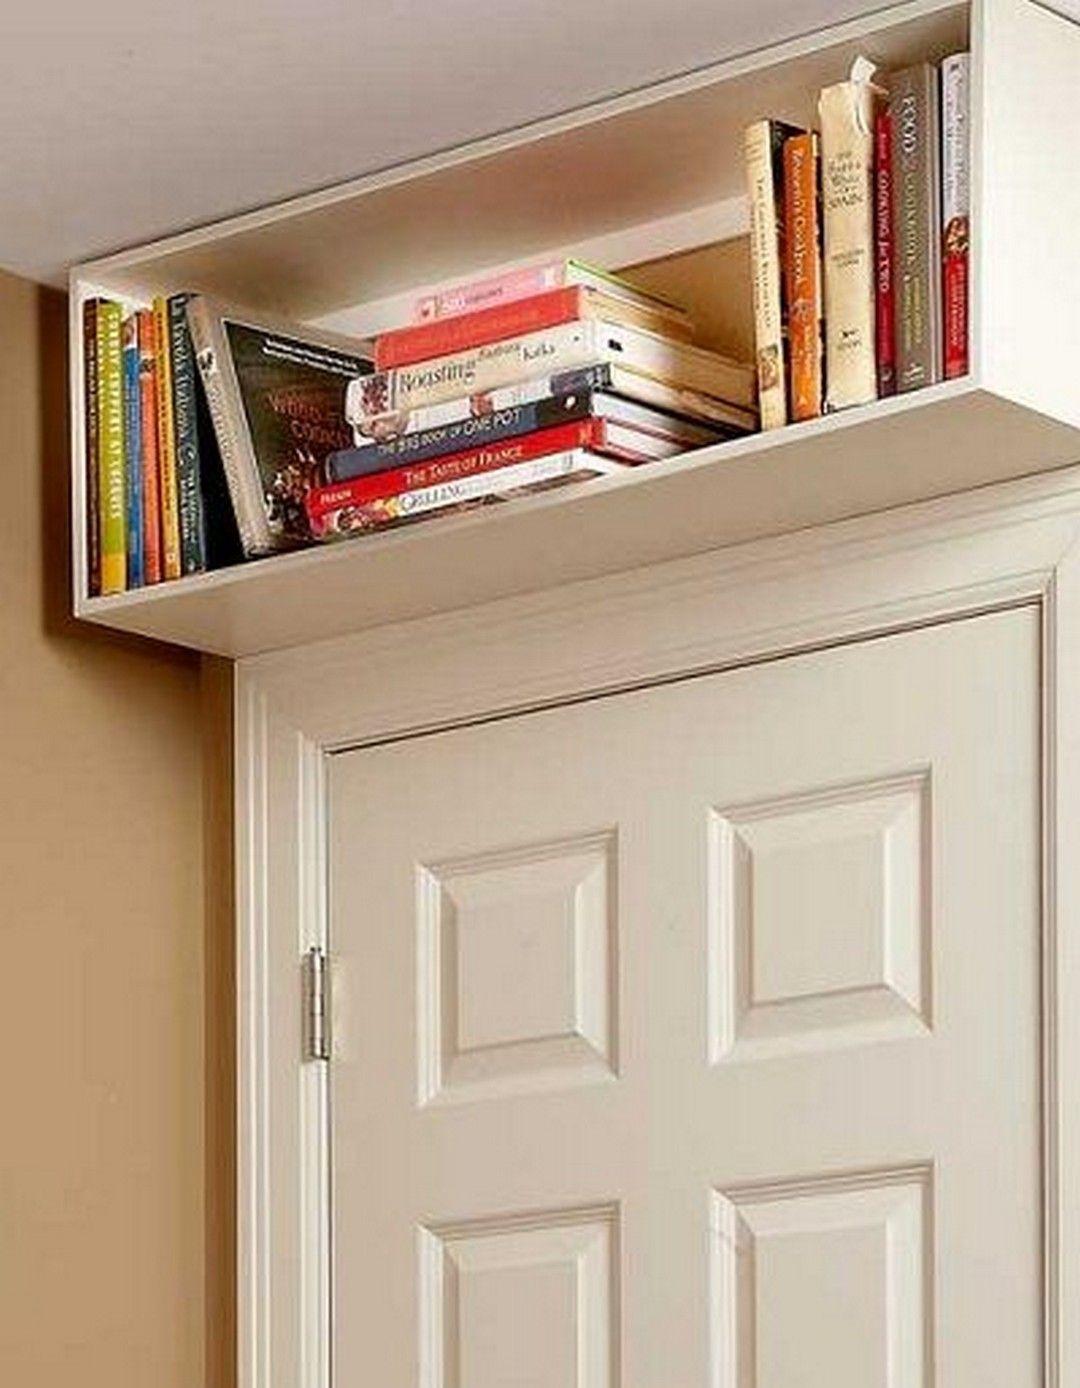 Easy Diy Small Bedroom Organization And Storage Hacks Small